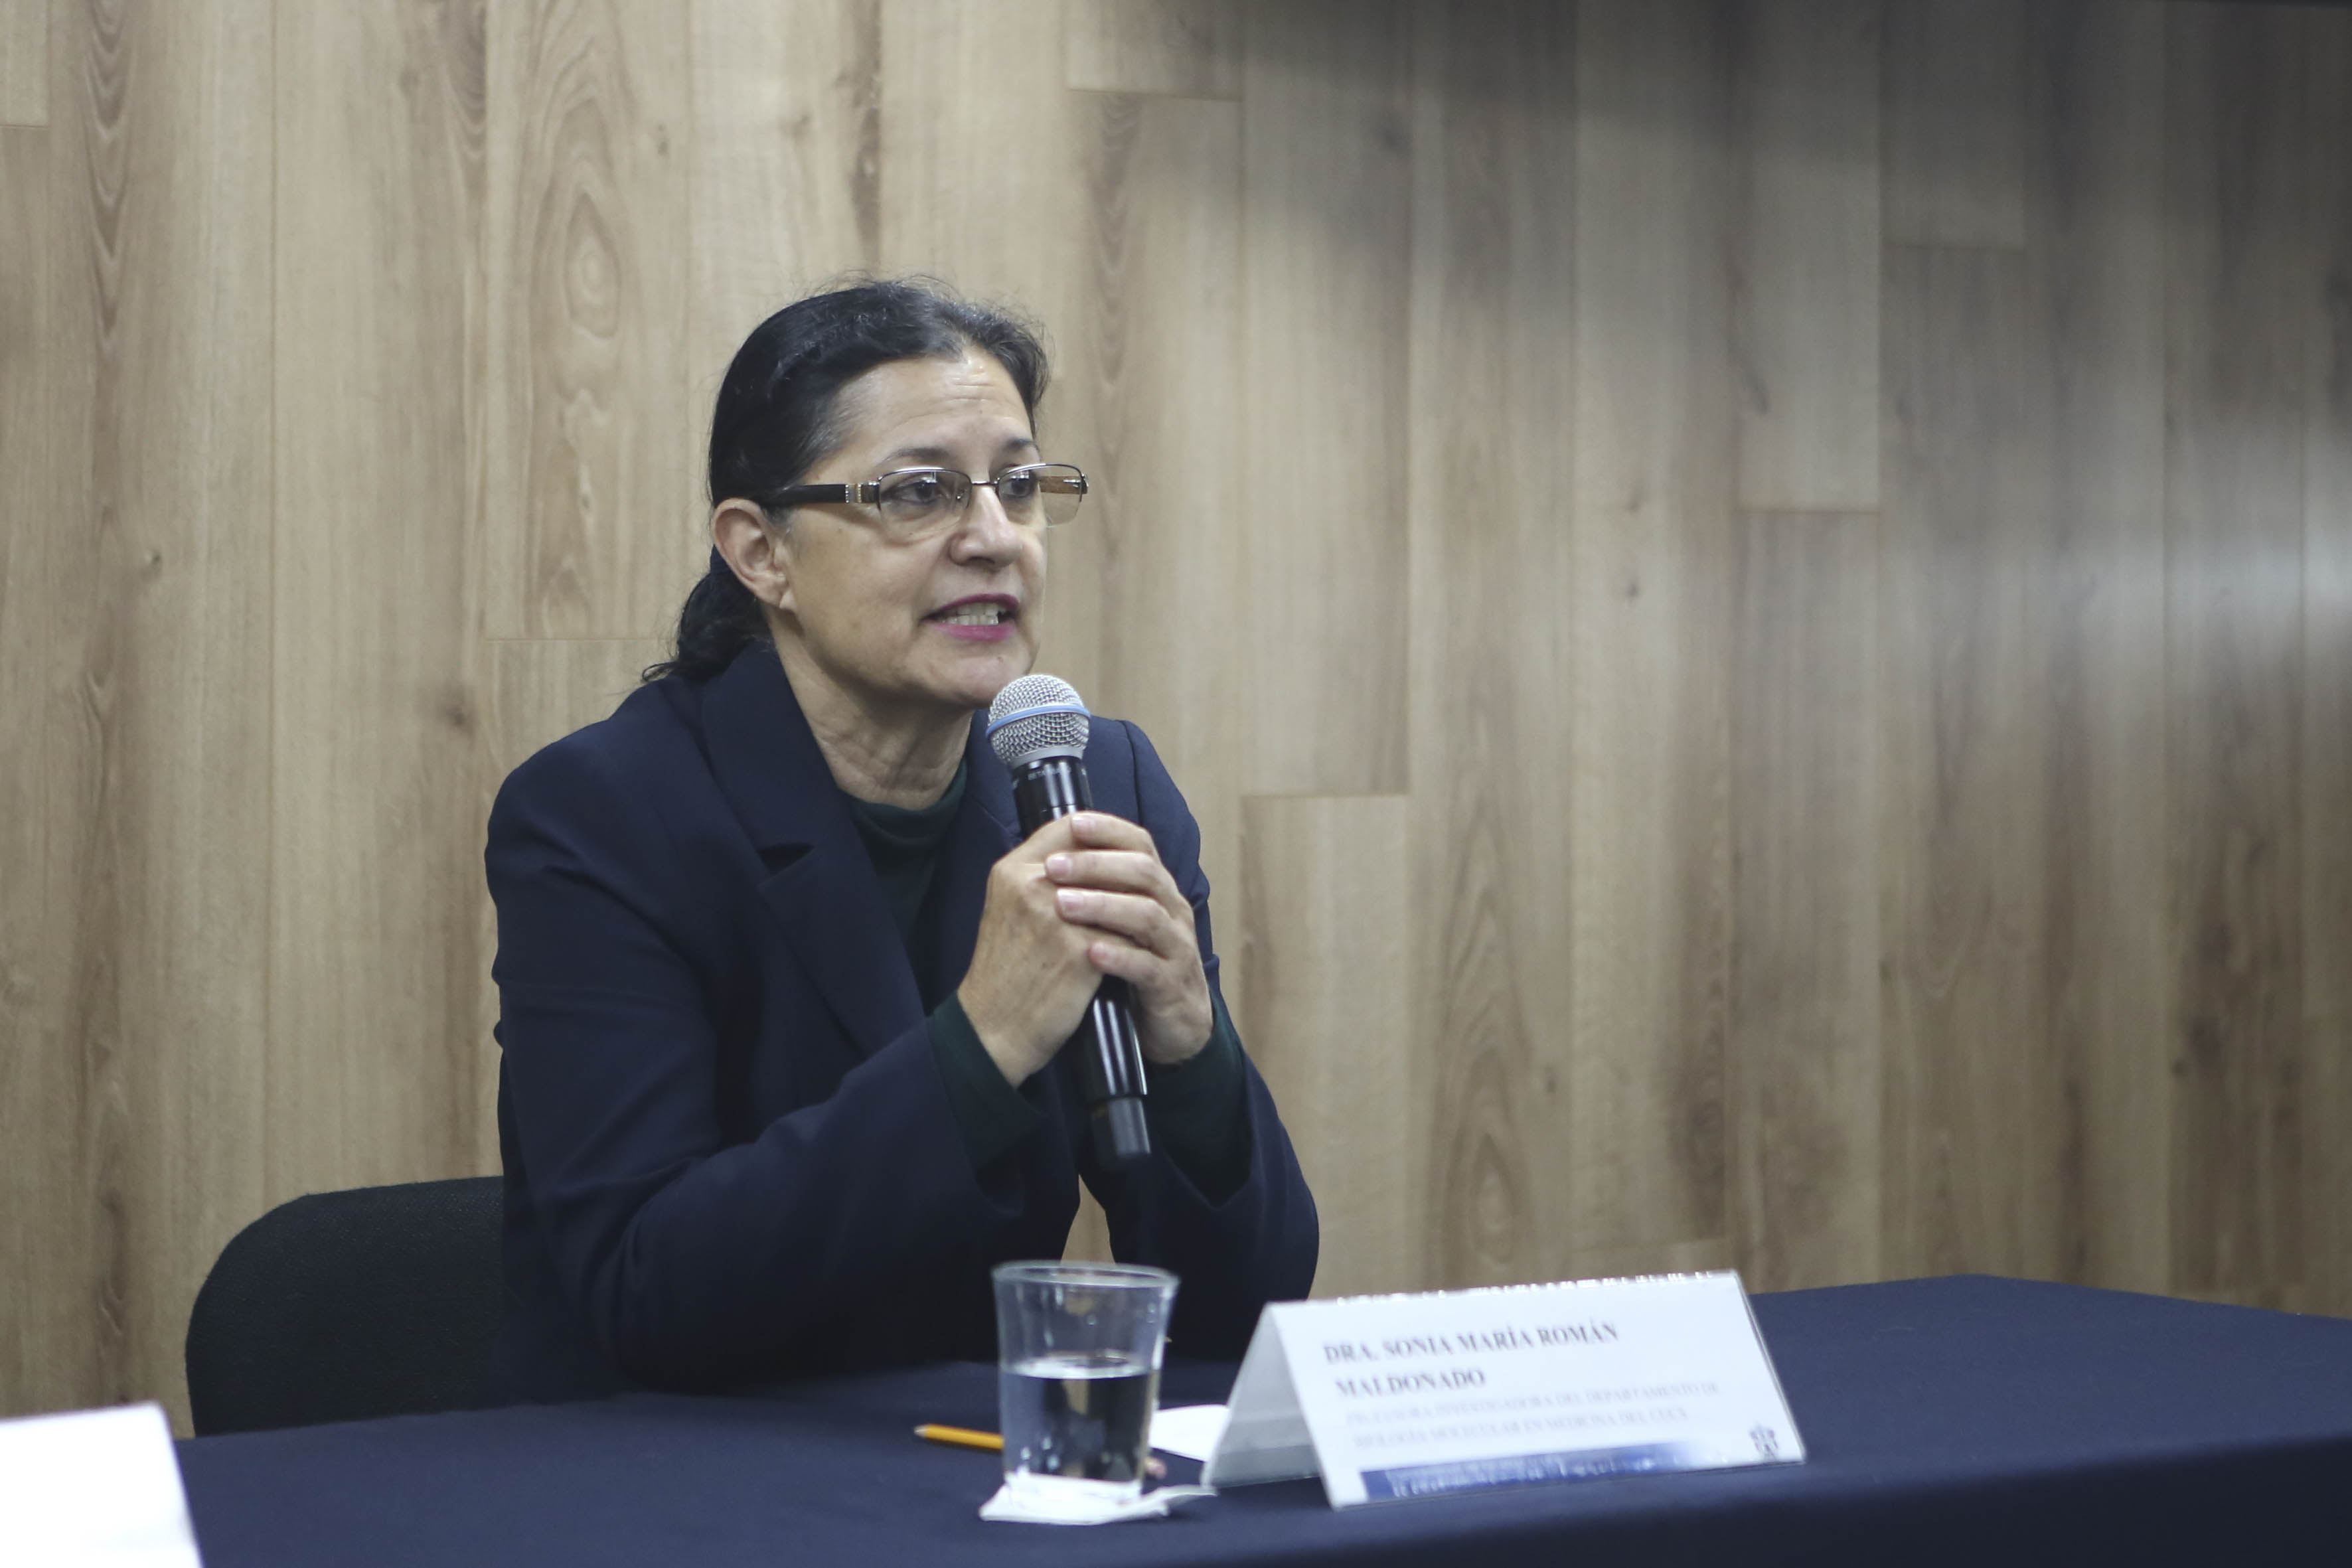 Dra. Sonia Román disertando durante la rueda de prensa